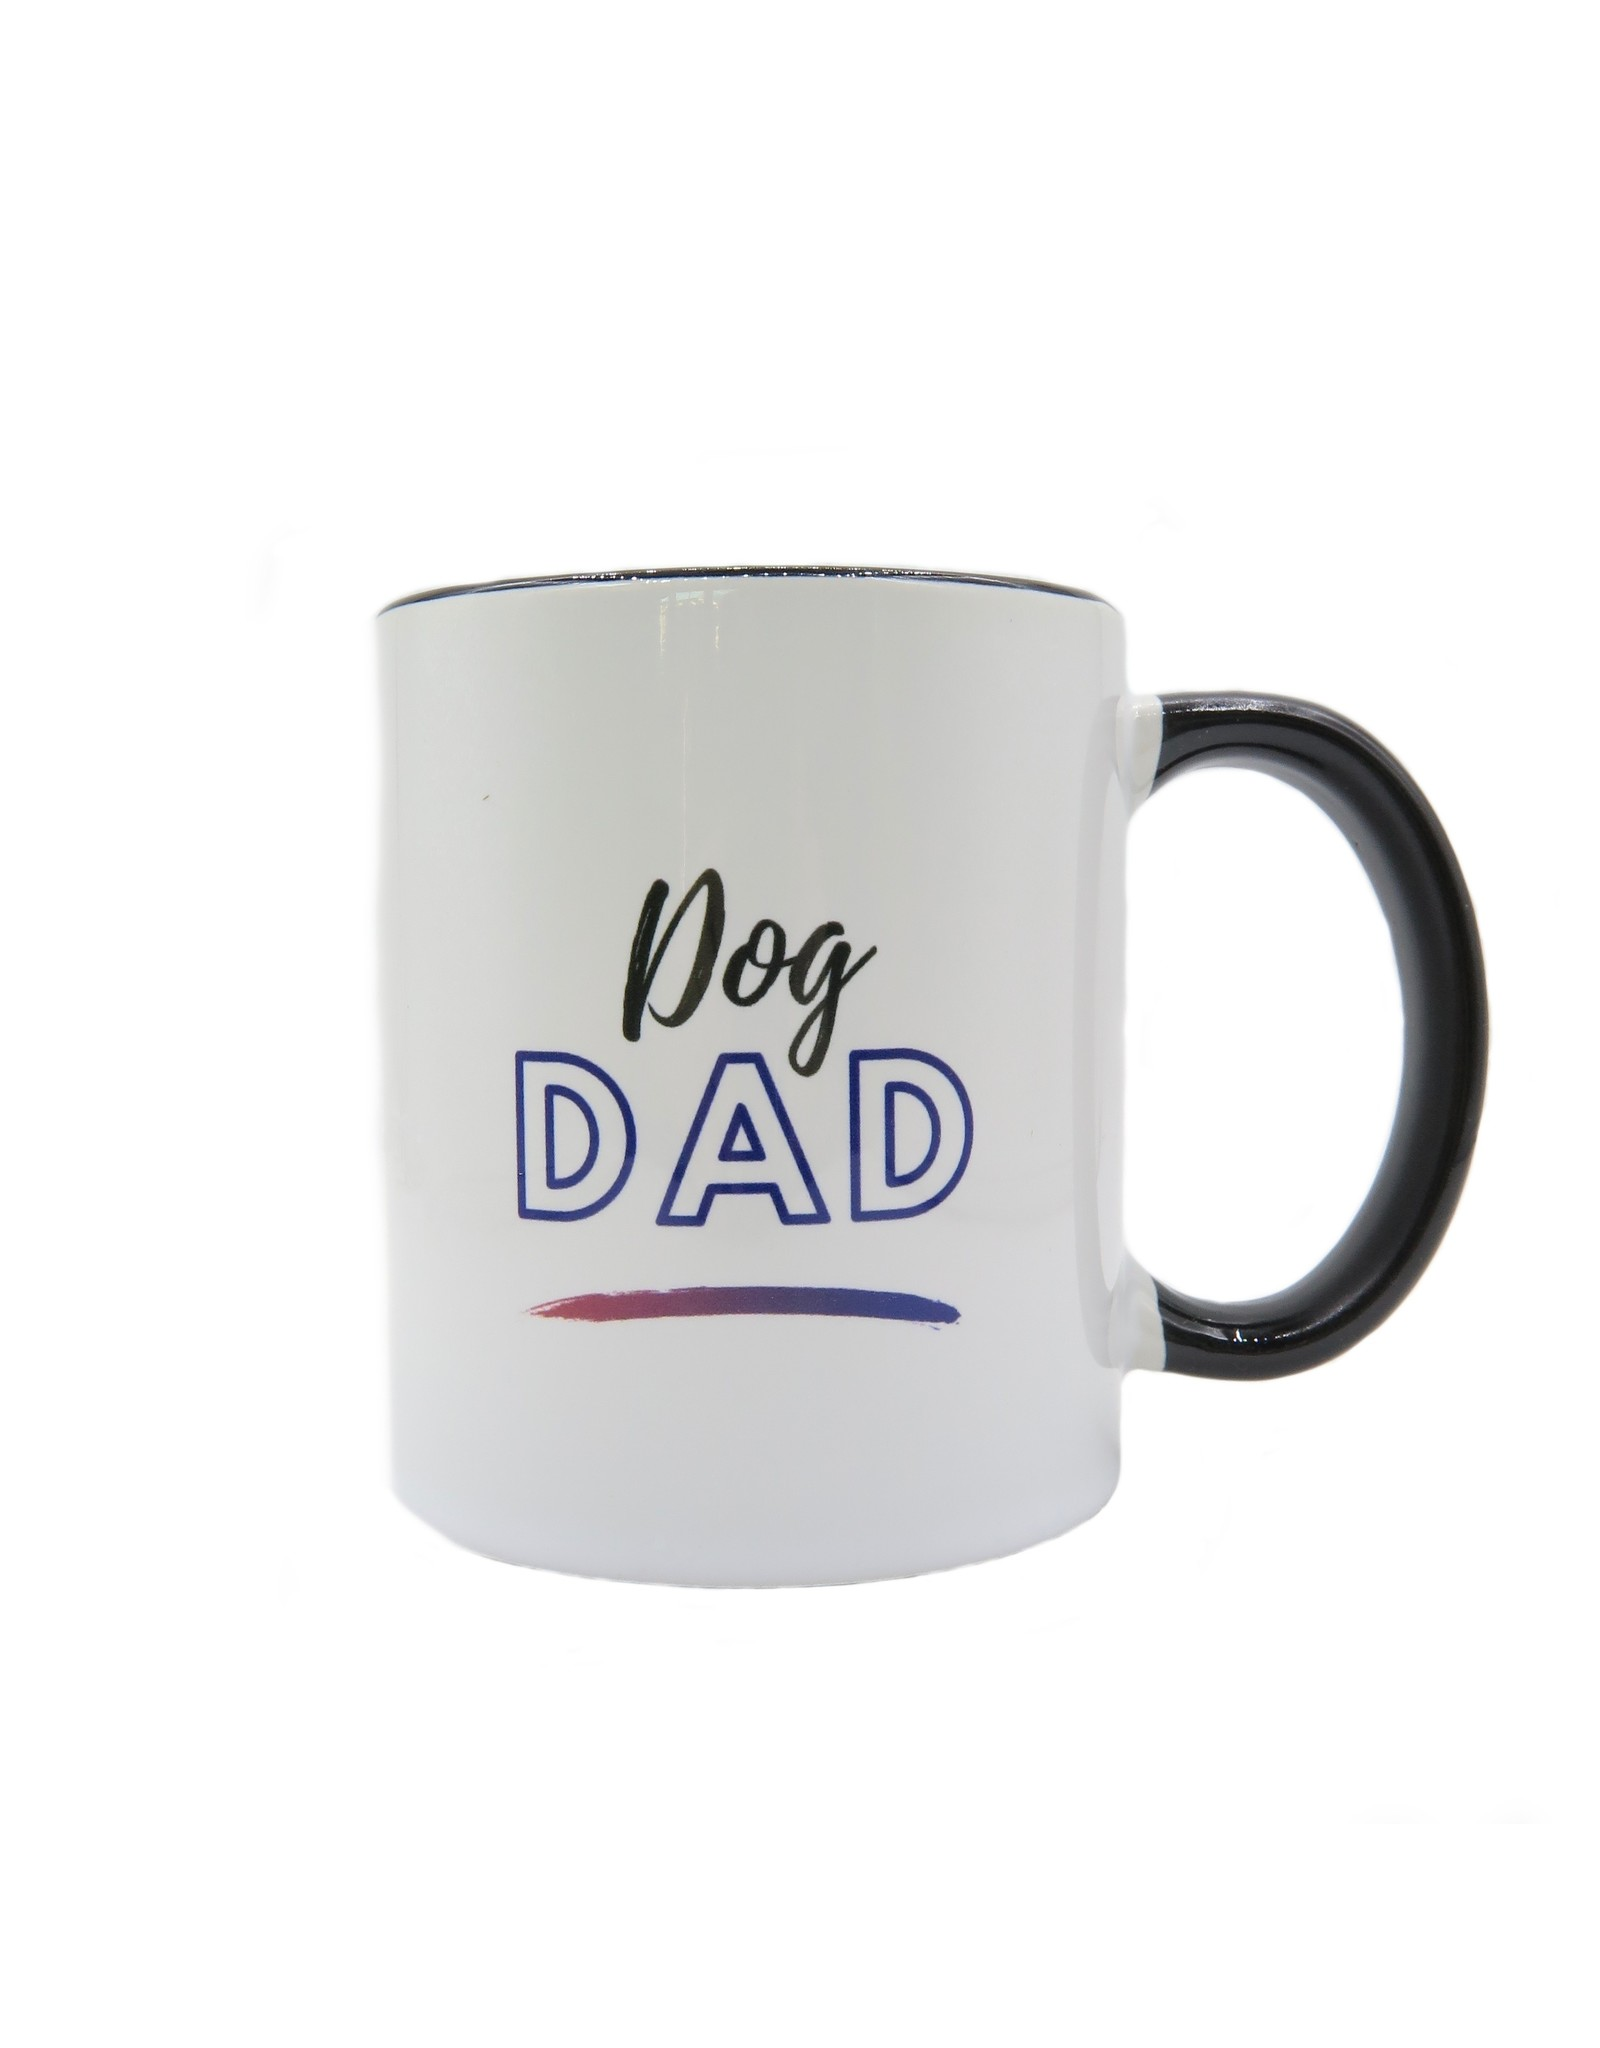 Dog dad mok